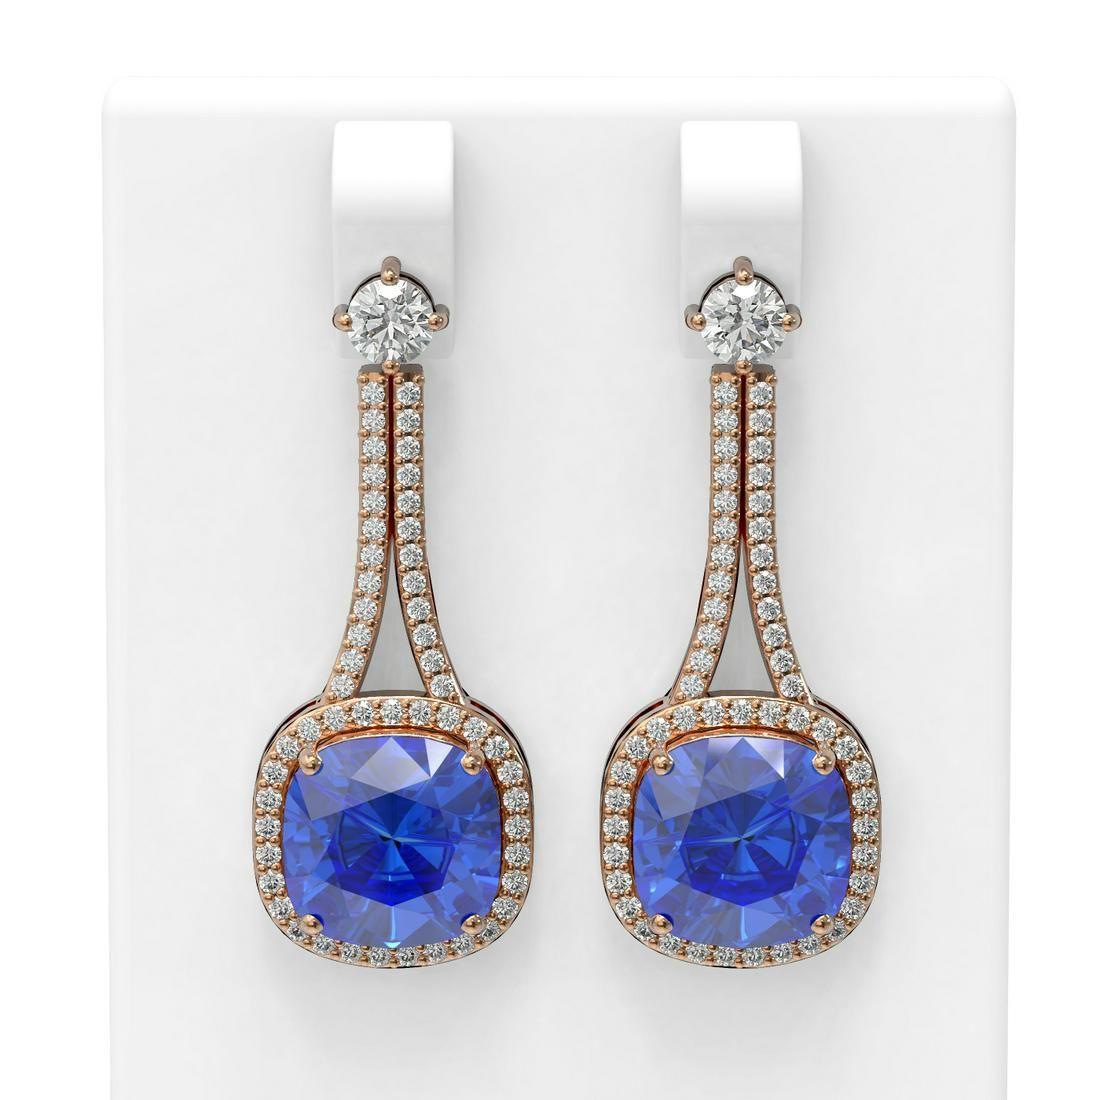 12.78 ctw Tanzanite & Diamond Earrings 18K Rose Gold -